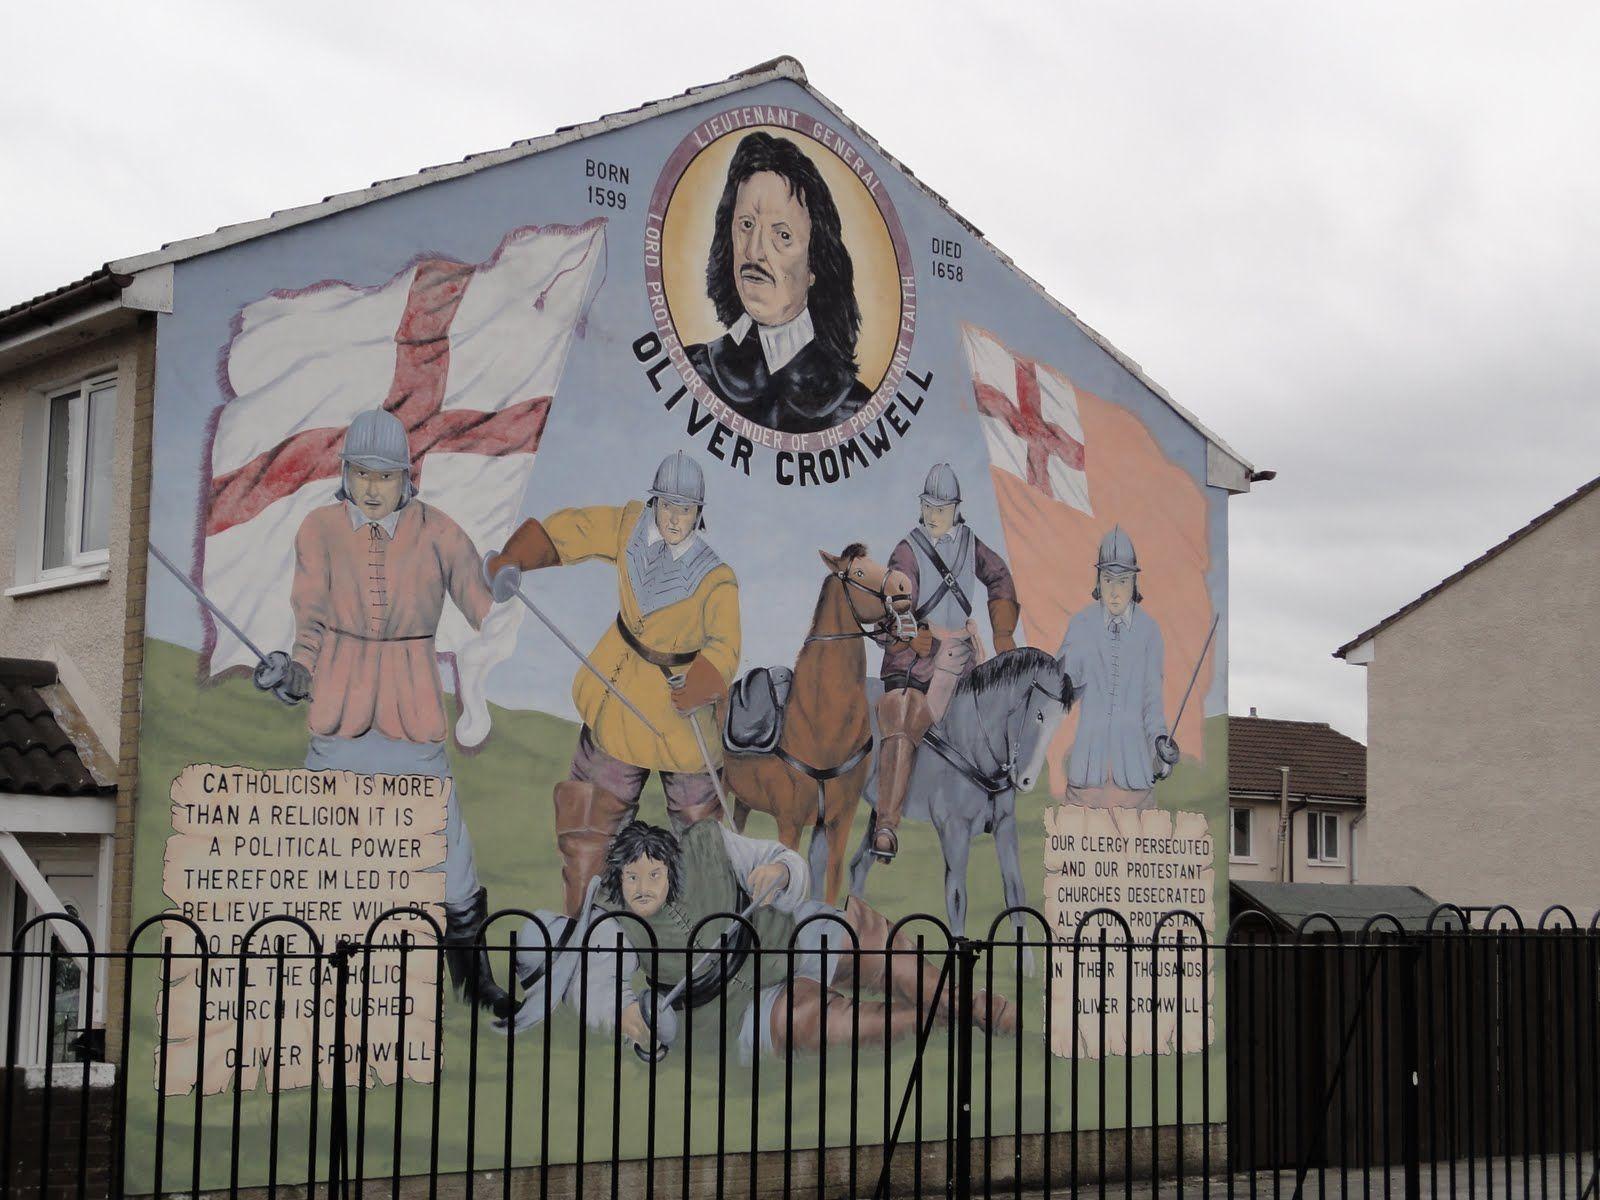 Mural from northern ireland northern ireland murals for Mural irlande